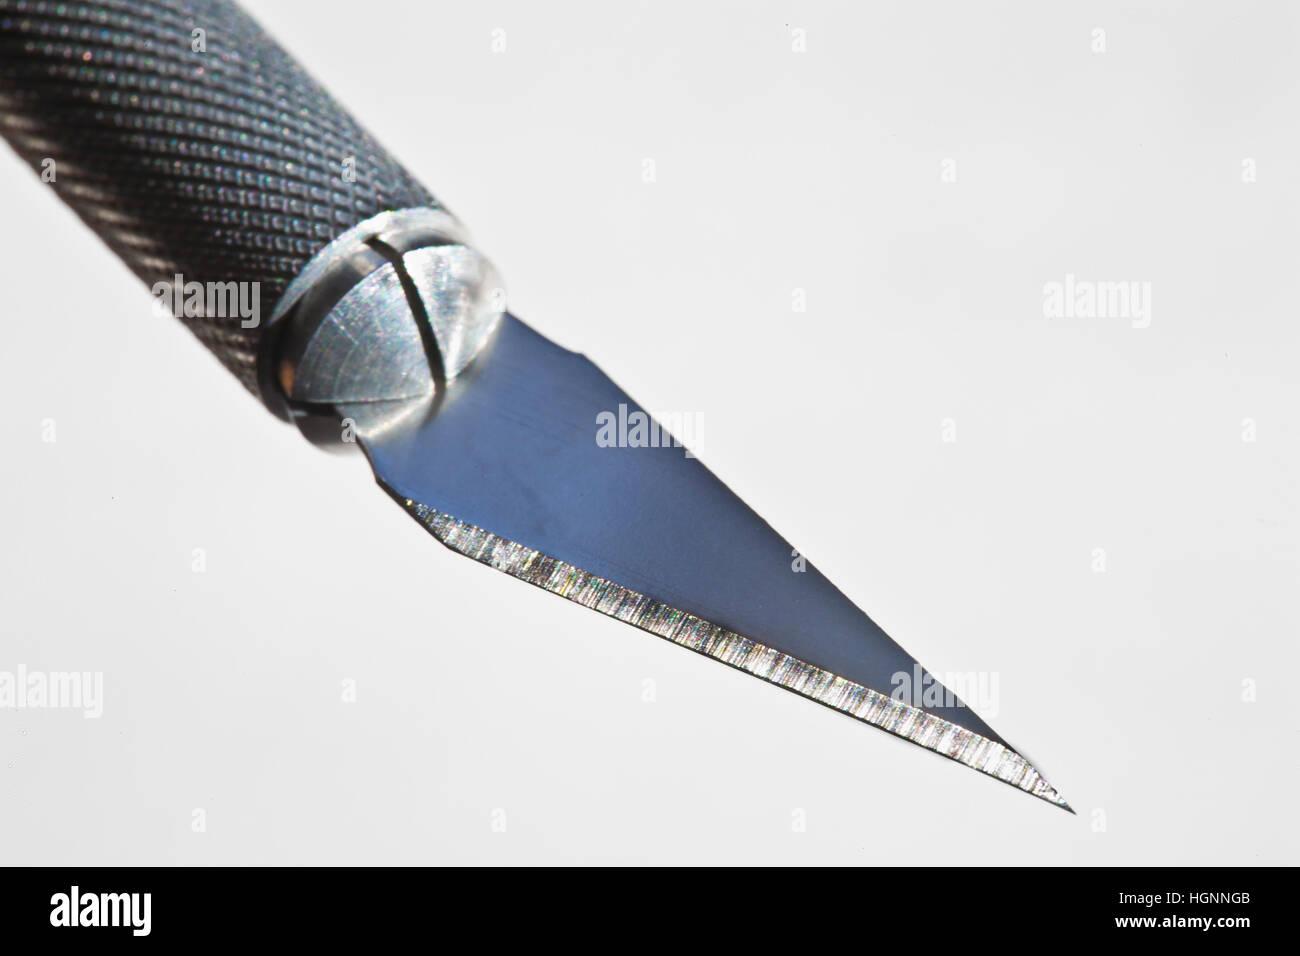 macro of xacto knife blade and handle on white backgrouond - Stock Image